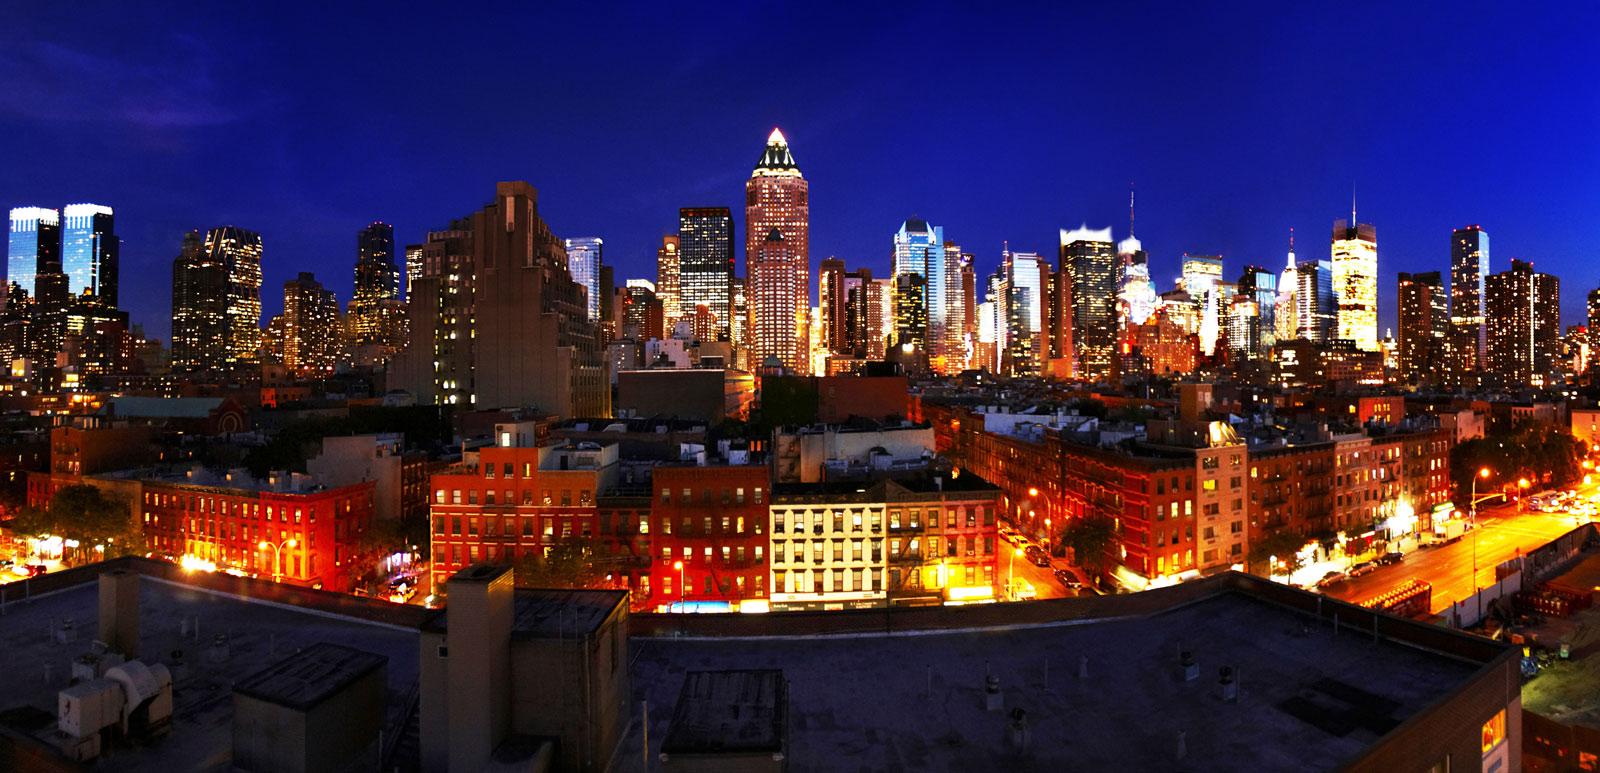 New york skyline hotel all tickets inc for Motor vehicle ny pay tickets